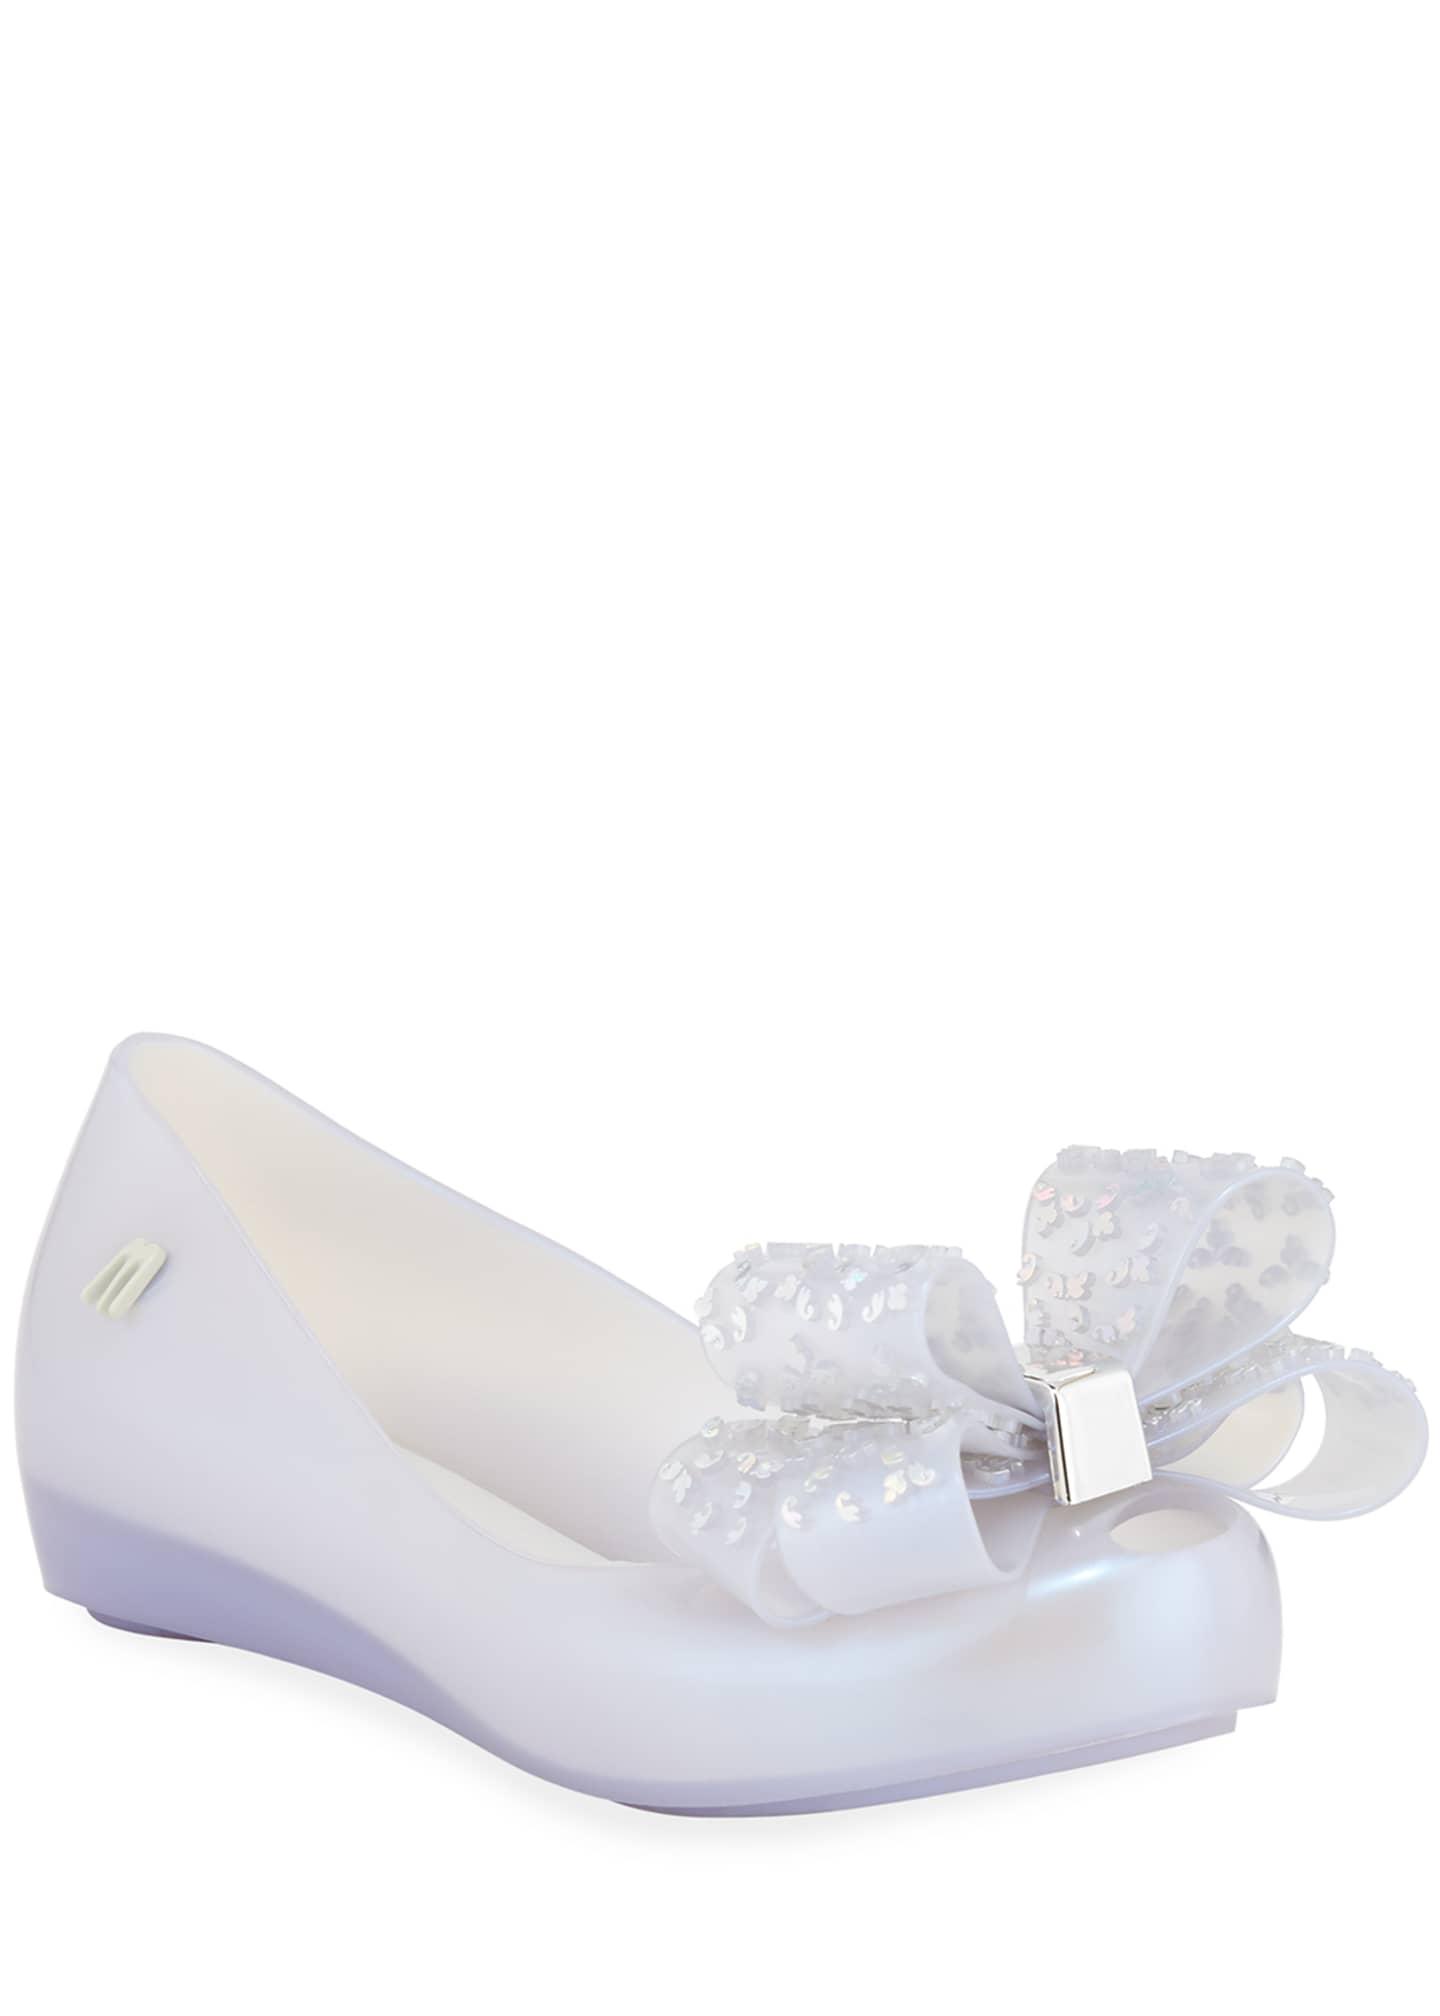 Mini Melissa Ultragirl Sweet IV Ballet Flats, Kids